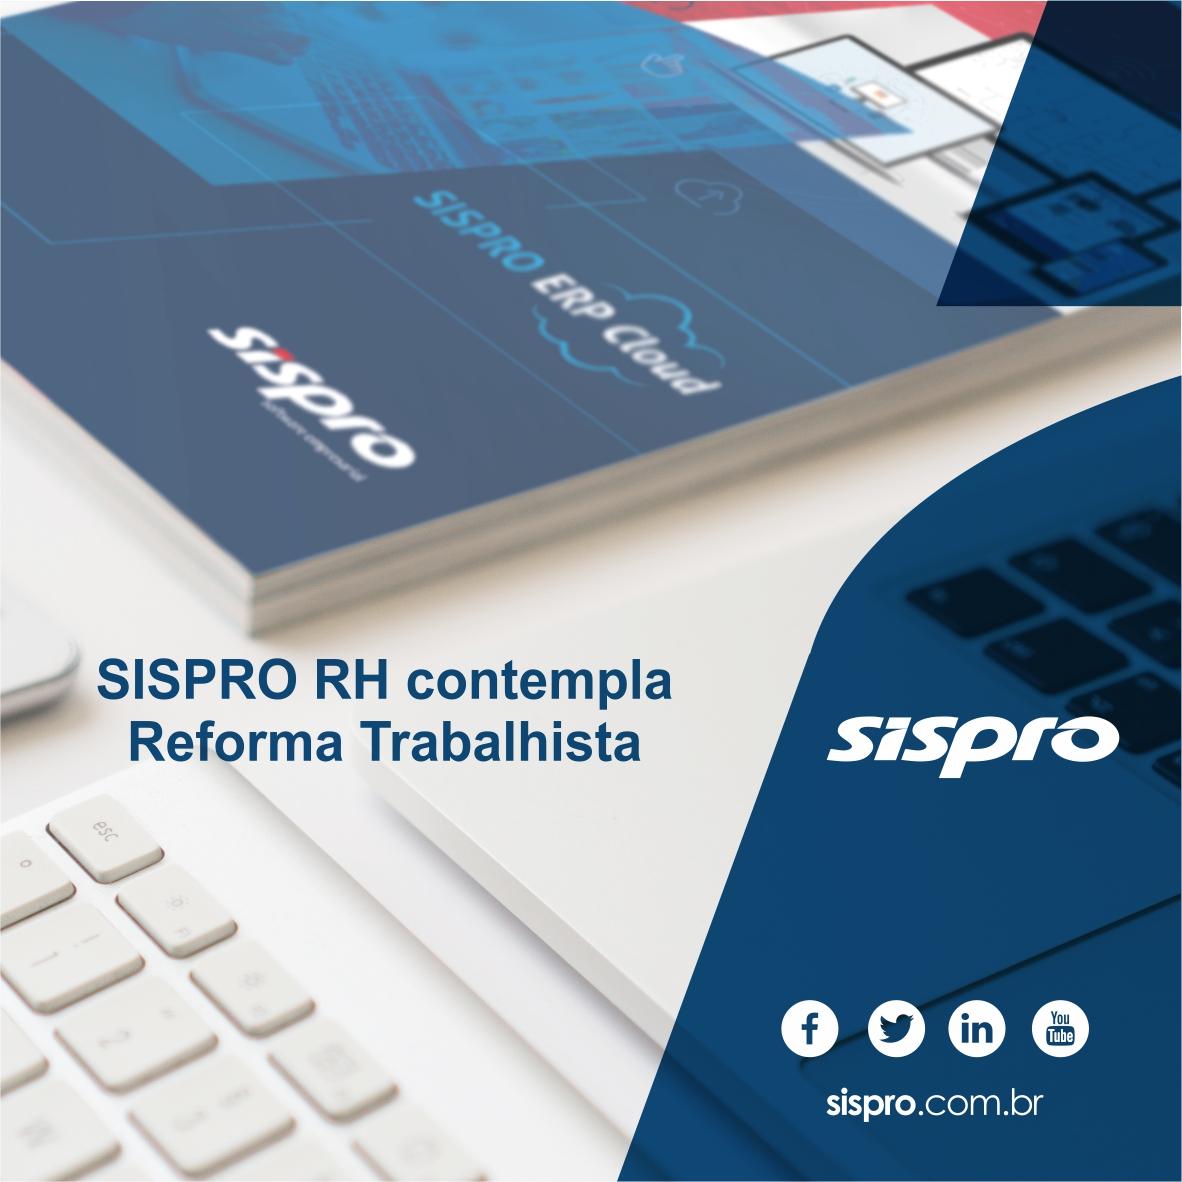 sispro-rh-contempla-reforma-trabalhista